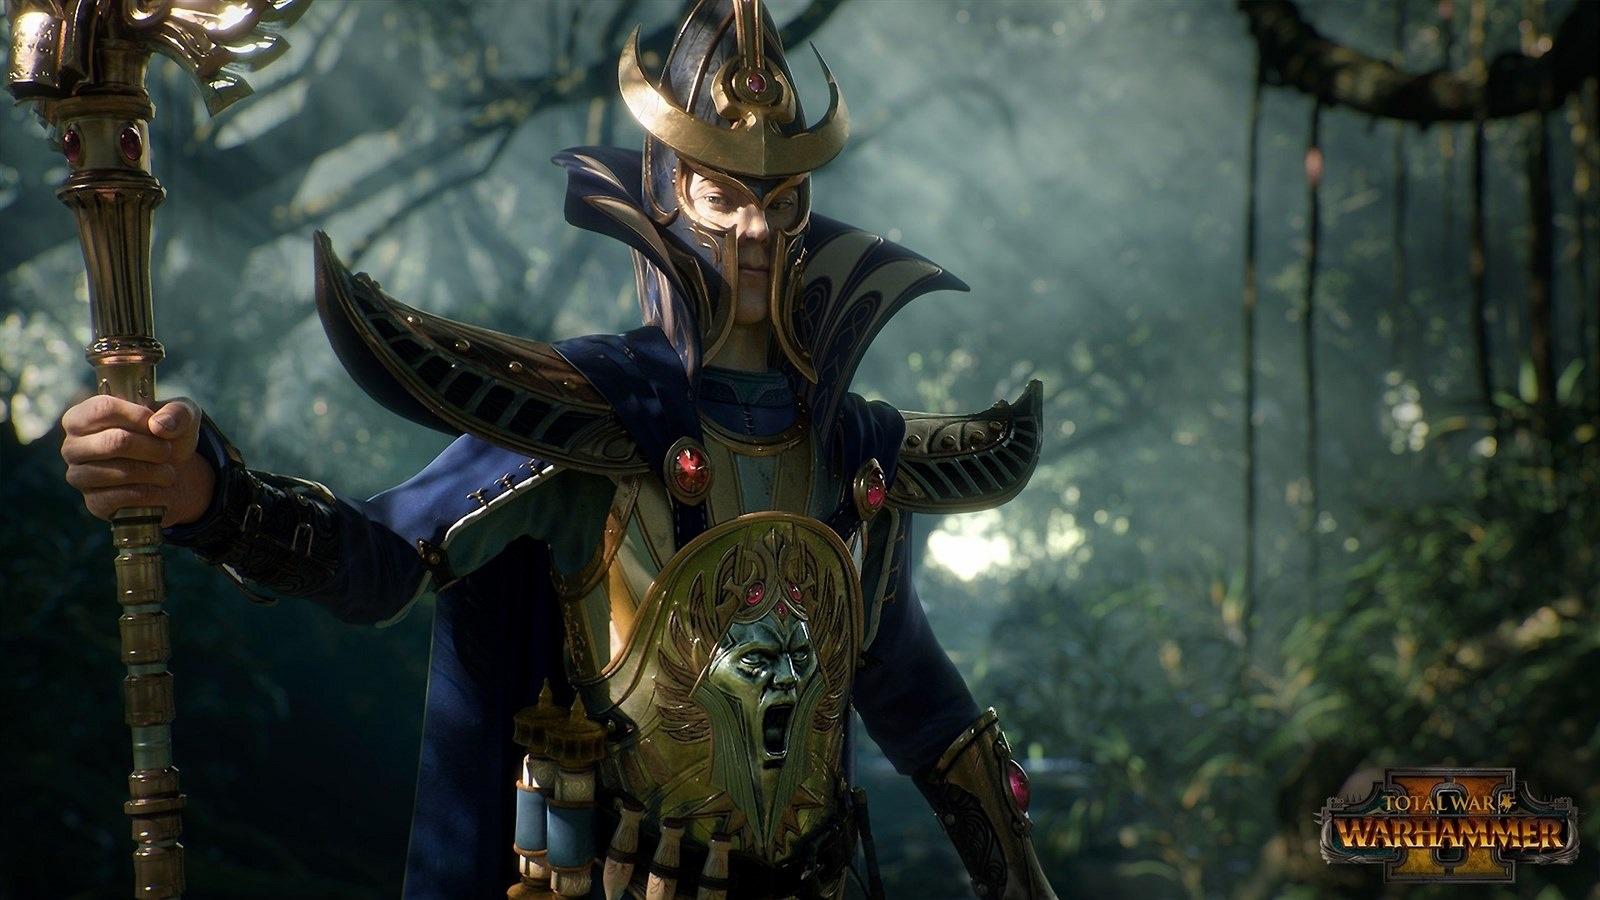 Total War Warhammer 2; Teclis